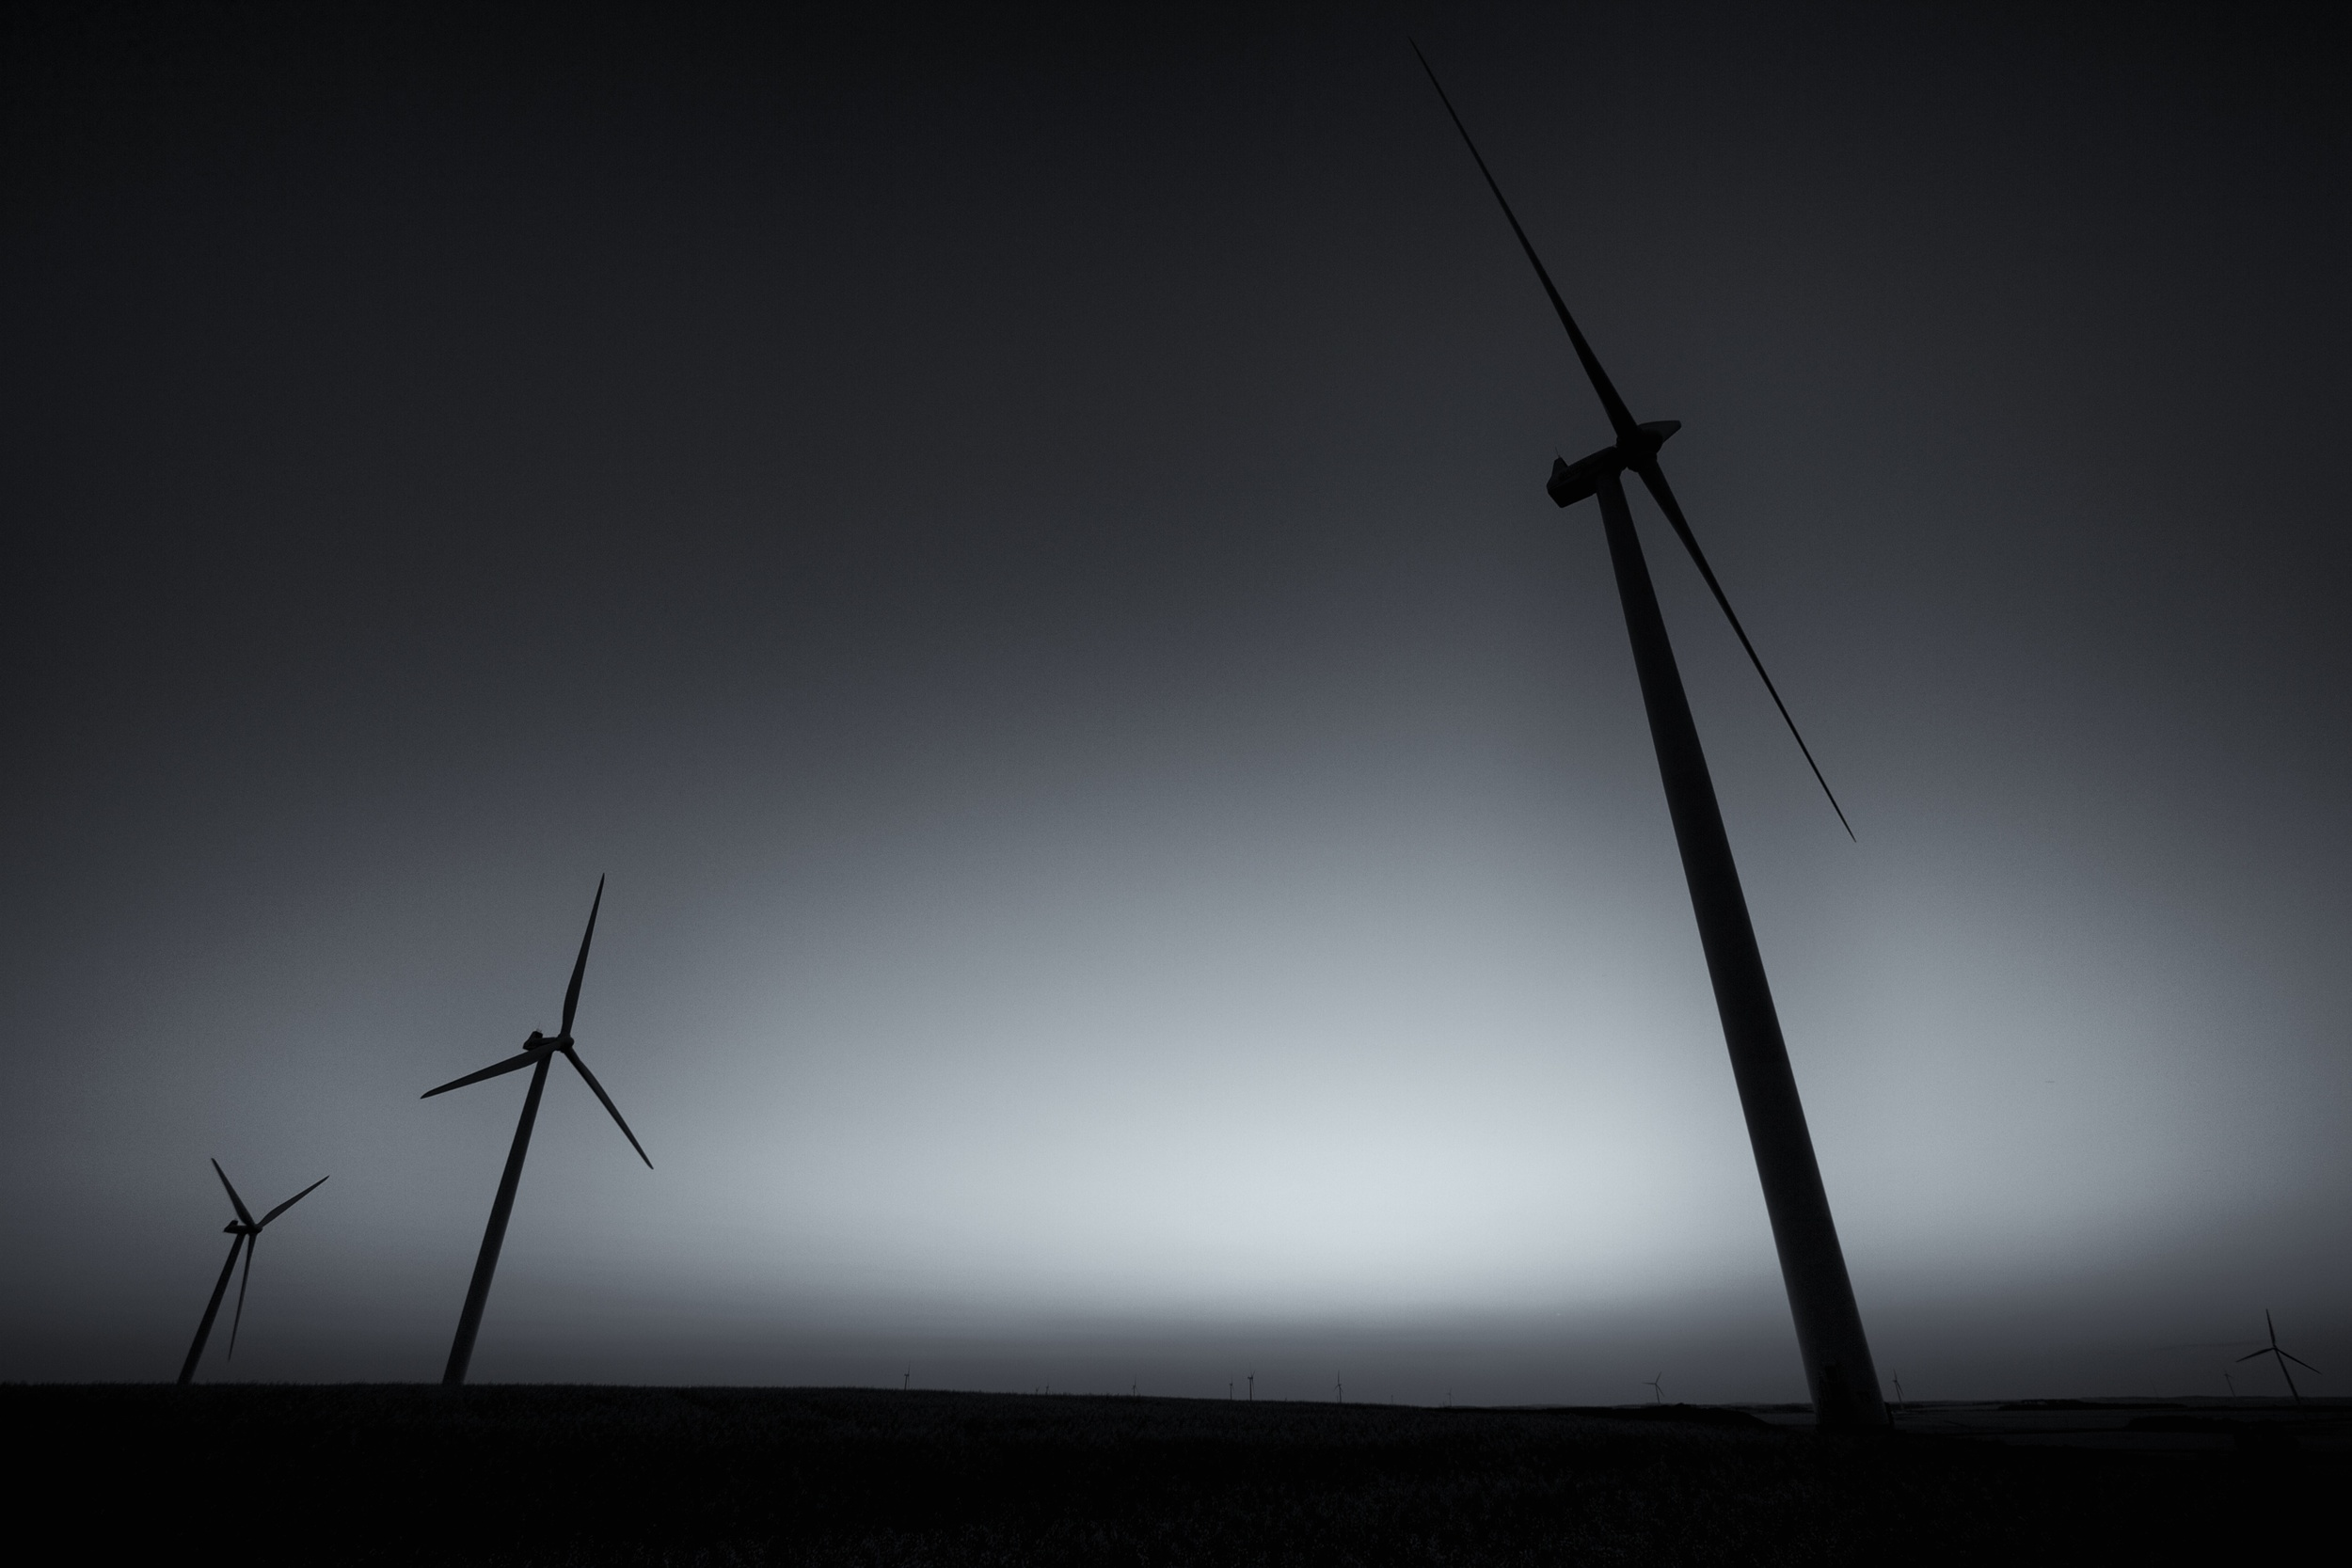 Tilting windmills reach into a darkening sky. Canon EOS 7D EF-S 10-22mm at 10mm f/5.6 1/100 ISO 100